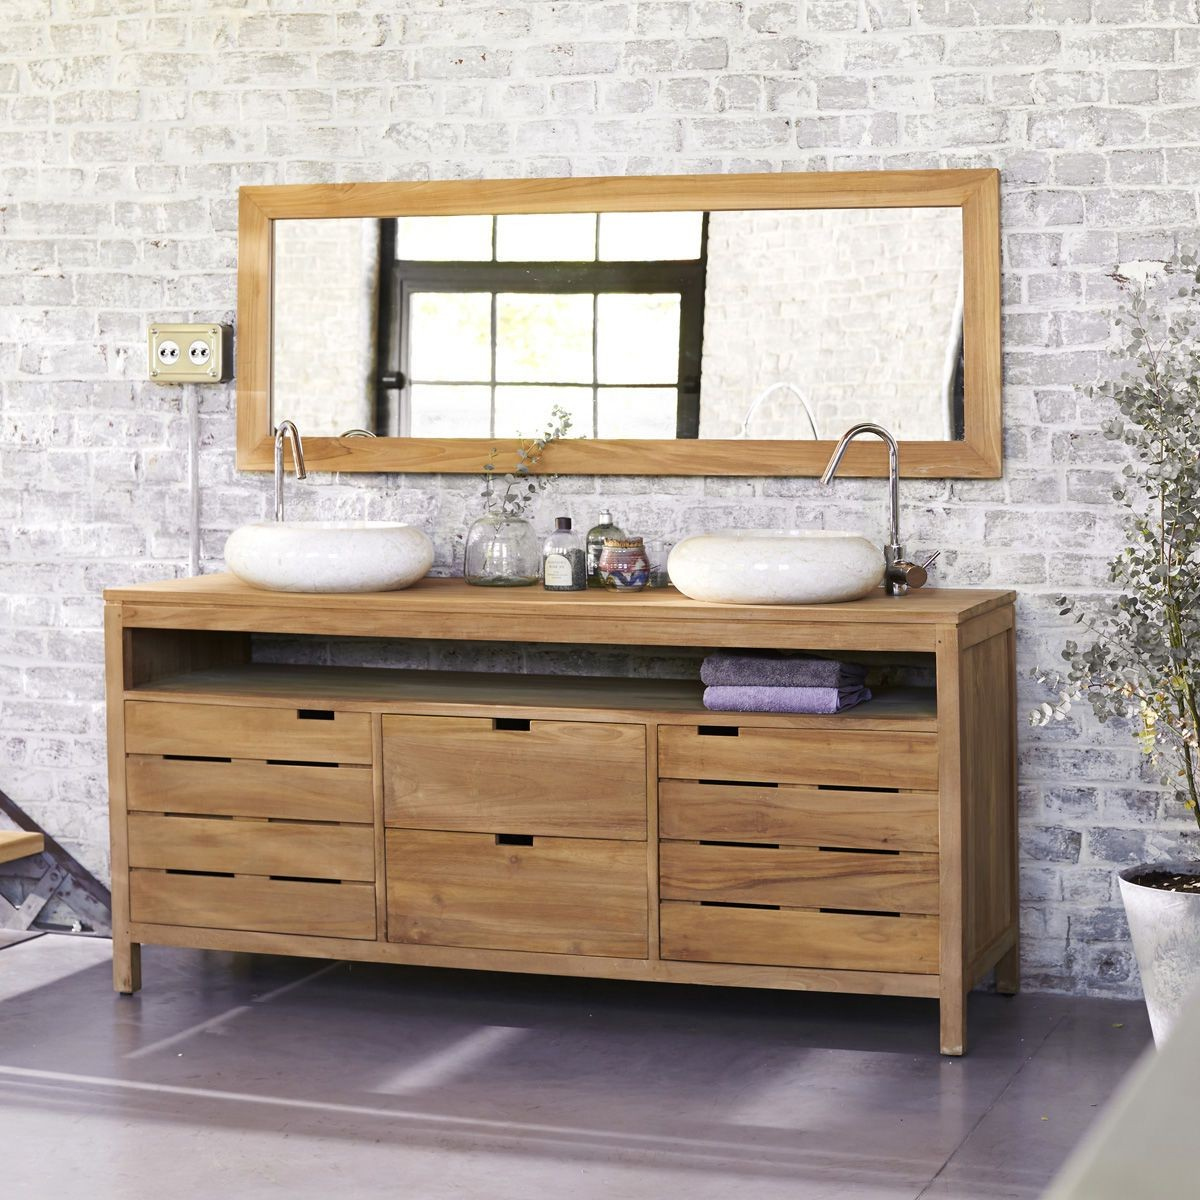 Meuble salle de bains ikea armoire id es de d coration for Meuble salle de bain ikea